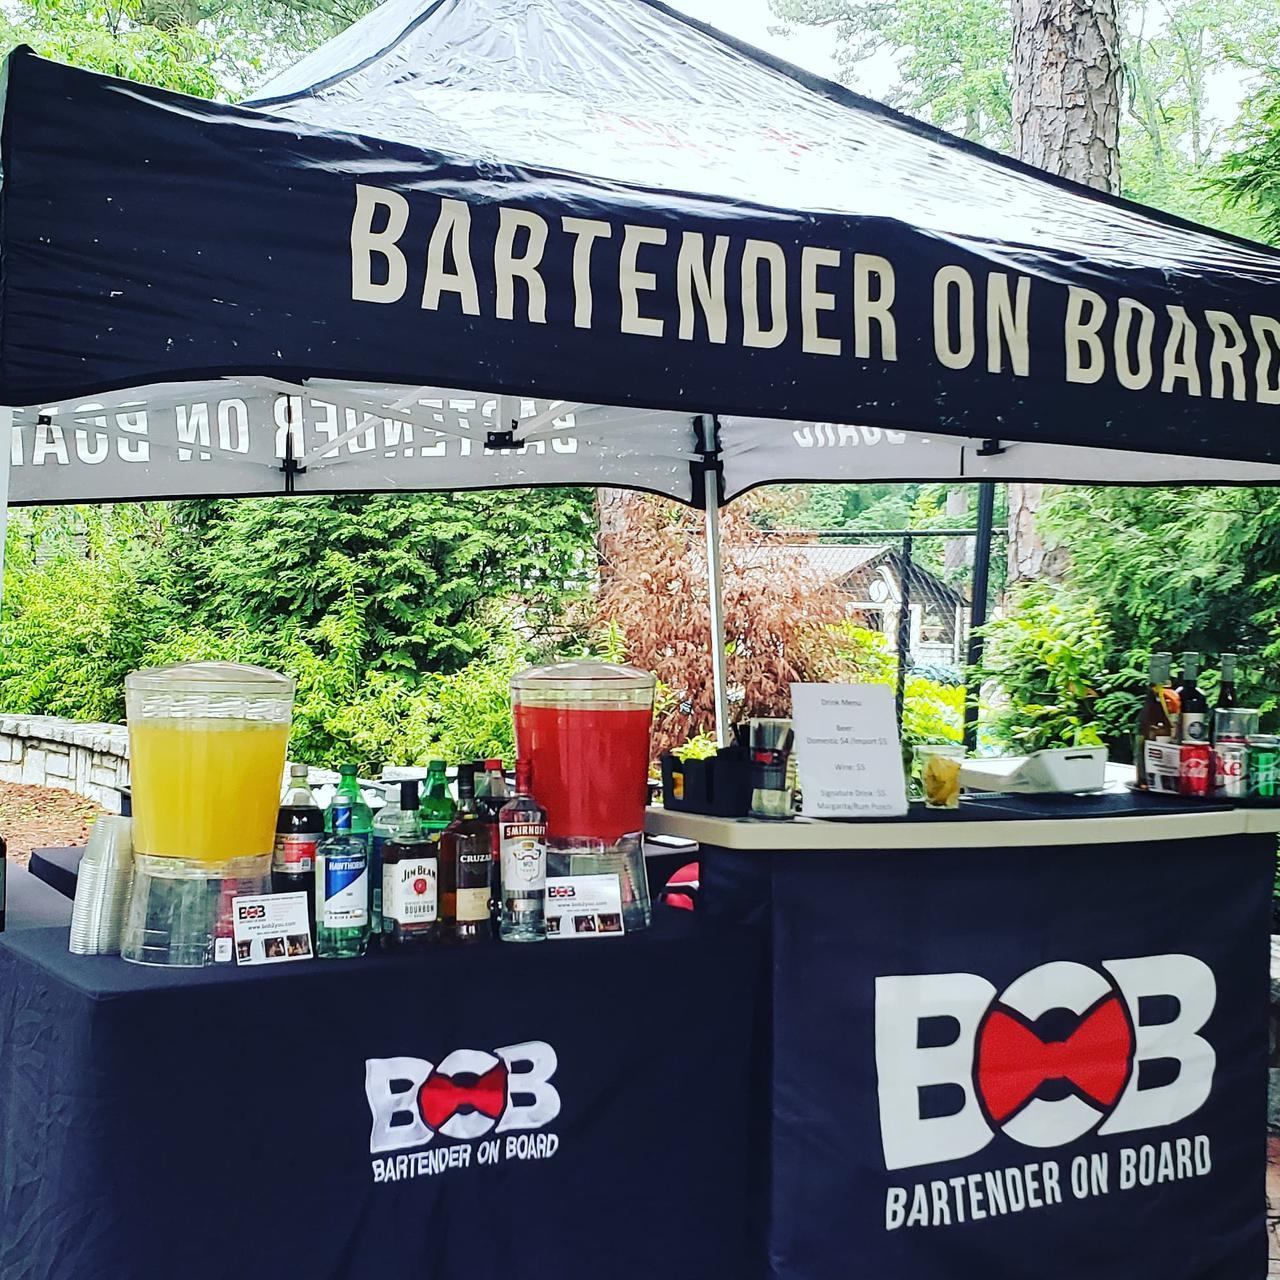 bartender on board mobile bartending tent at event in atlanta metro area